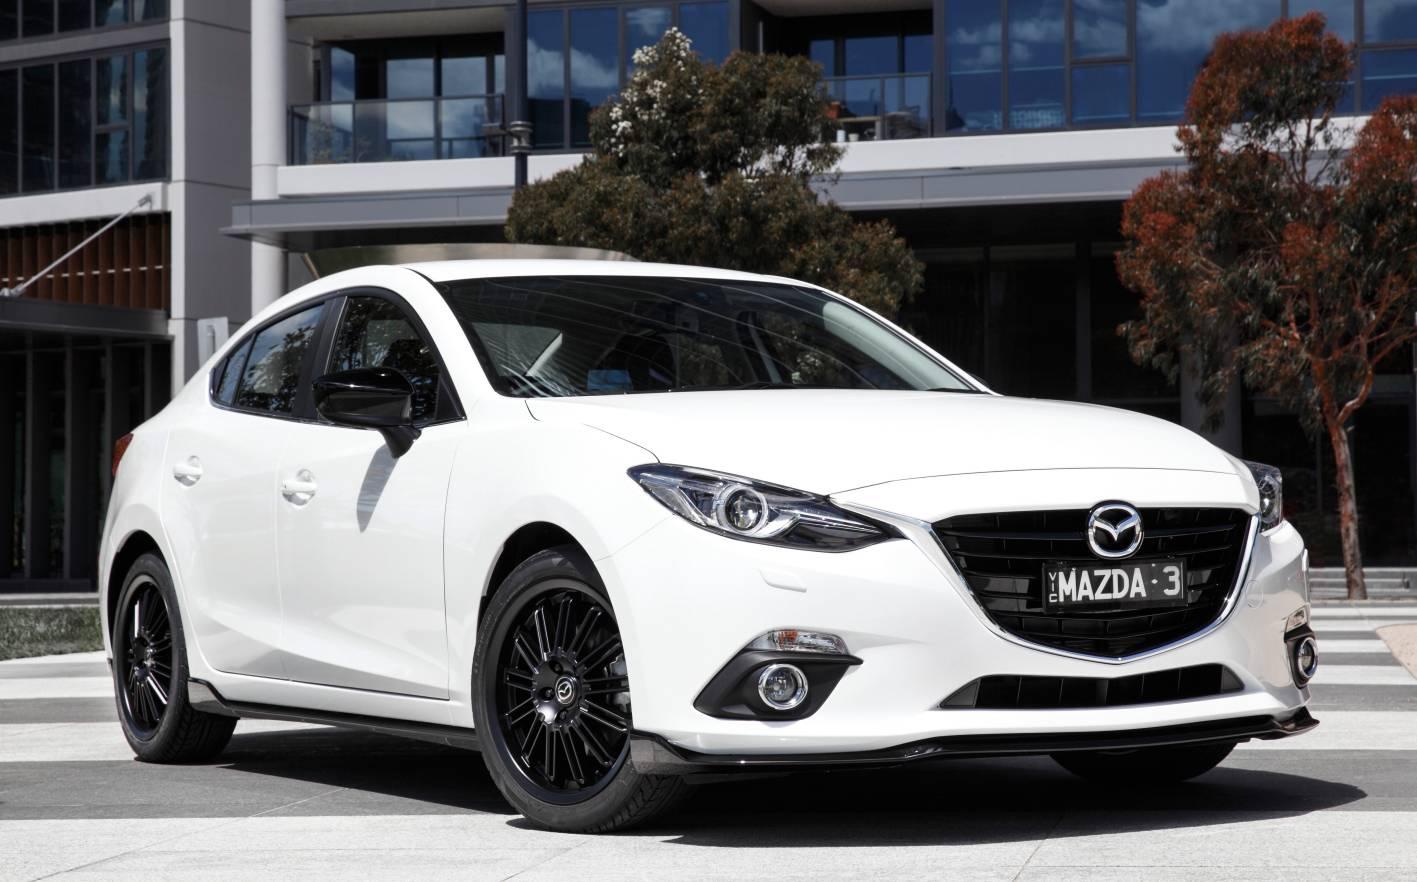 2014 Mazda3 sedan-white2014 Mazda 3 White